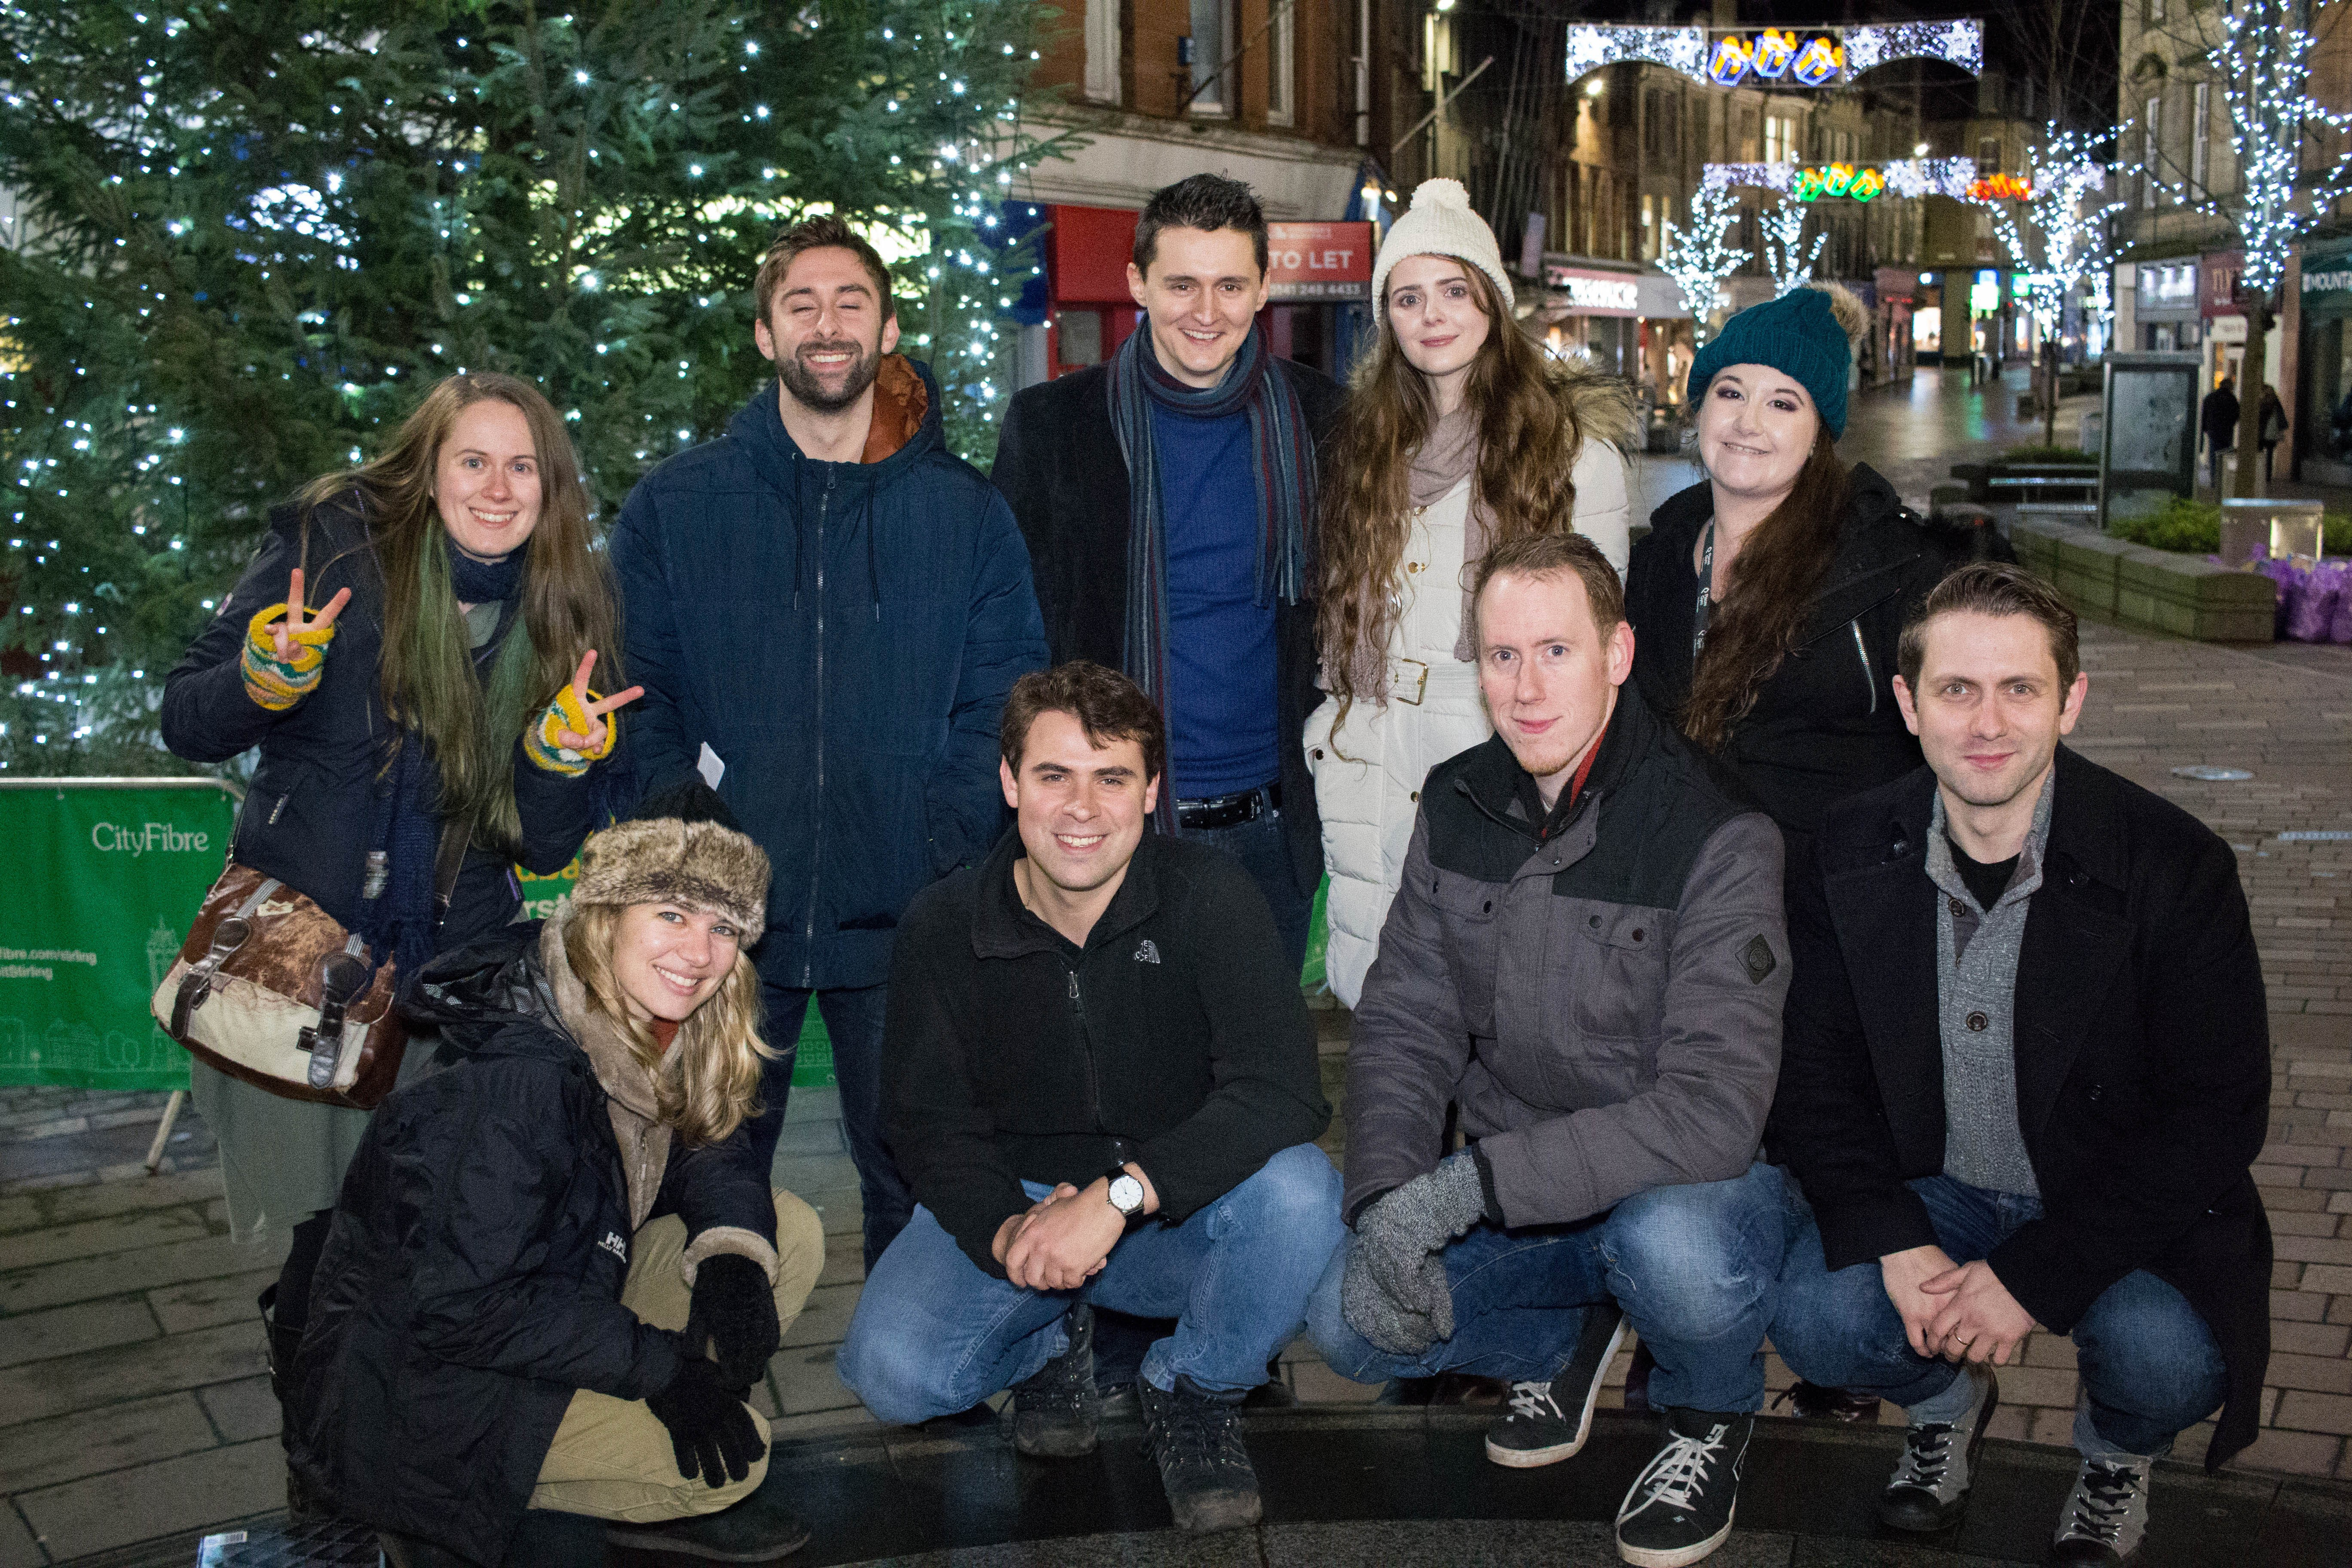 Above (clockwise from top left): Jessica Henderson, Joshua Gajree, Andrew Gourlay, Rowan Birkett, Emma Tully, Grant R Keelan, Simon Fox, Gavin Hugh, Savannah Morgan.